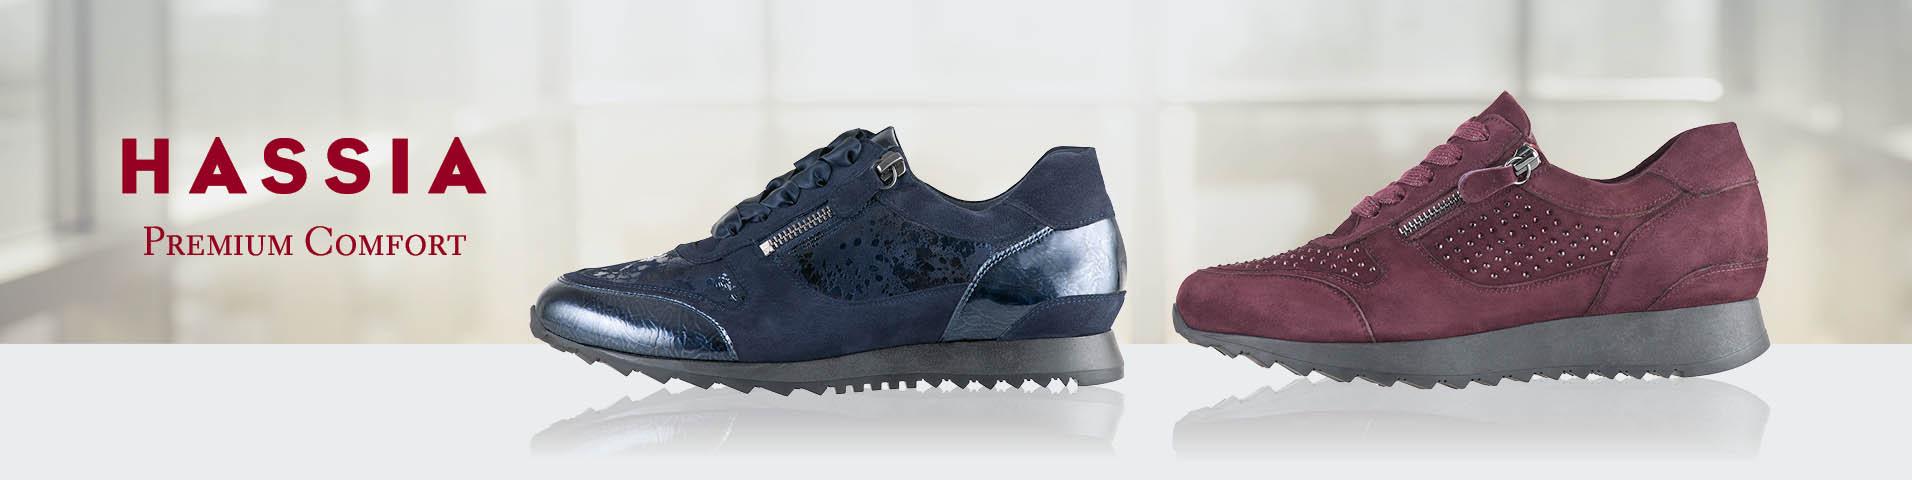 HASSIA Sneaker online kaufen   Mach s dir bequem   ZALANDO 9452b60b27